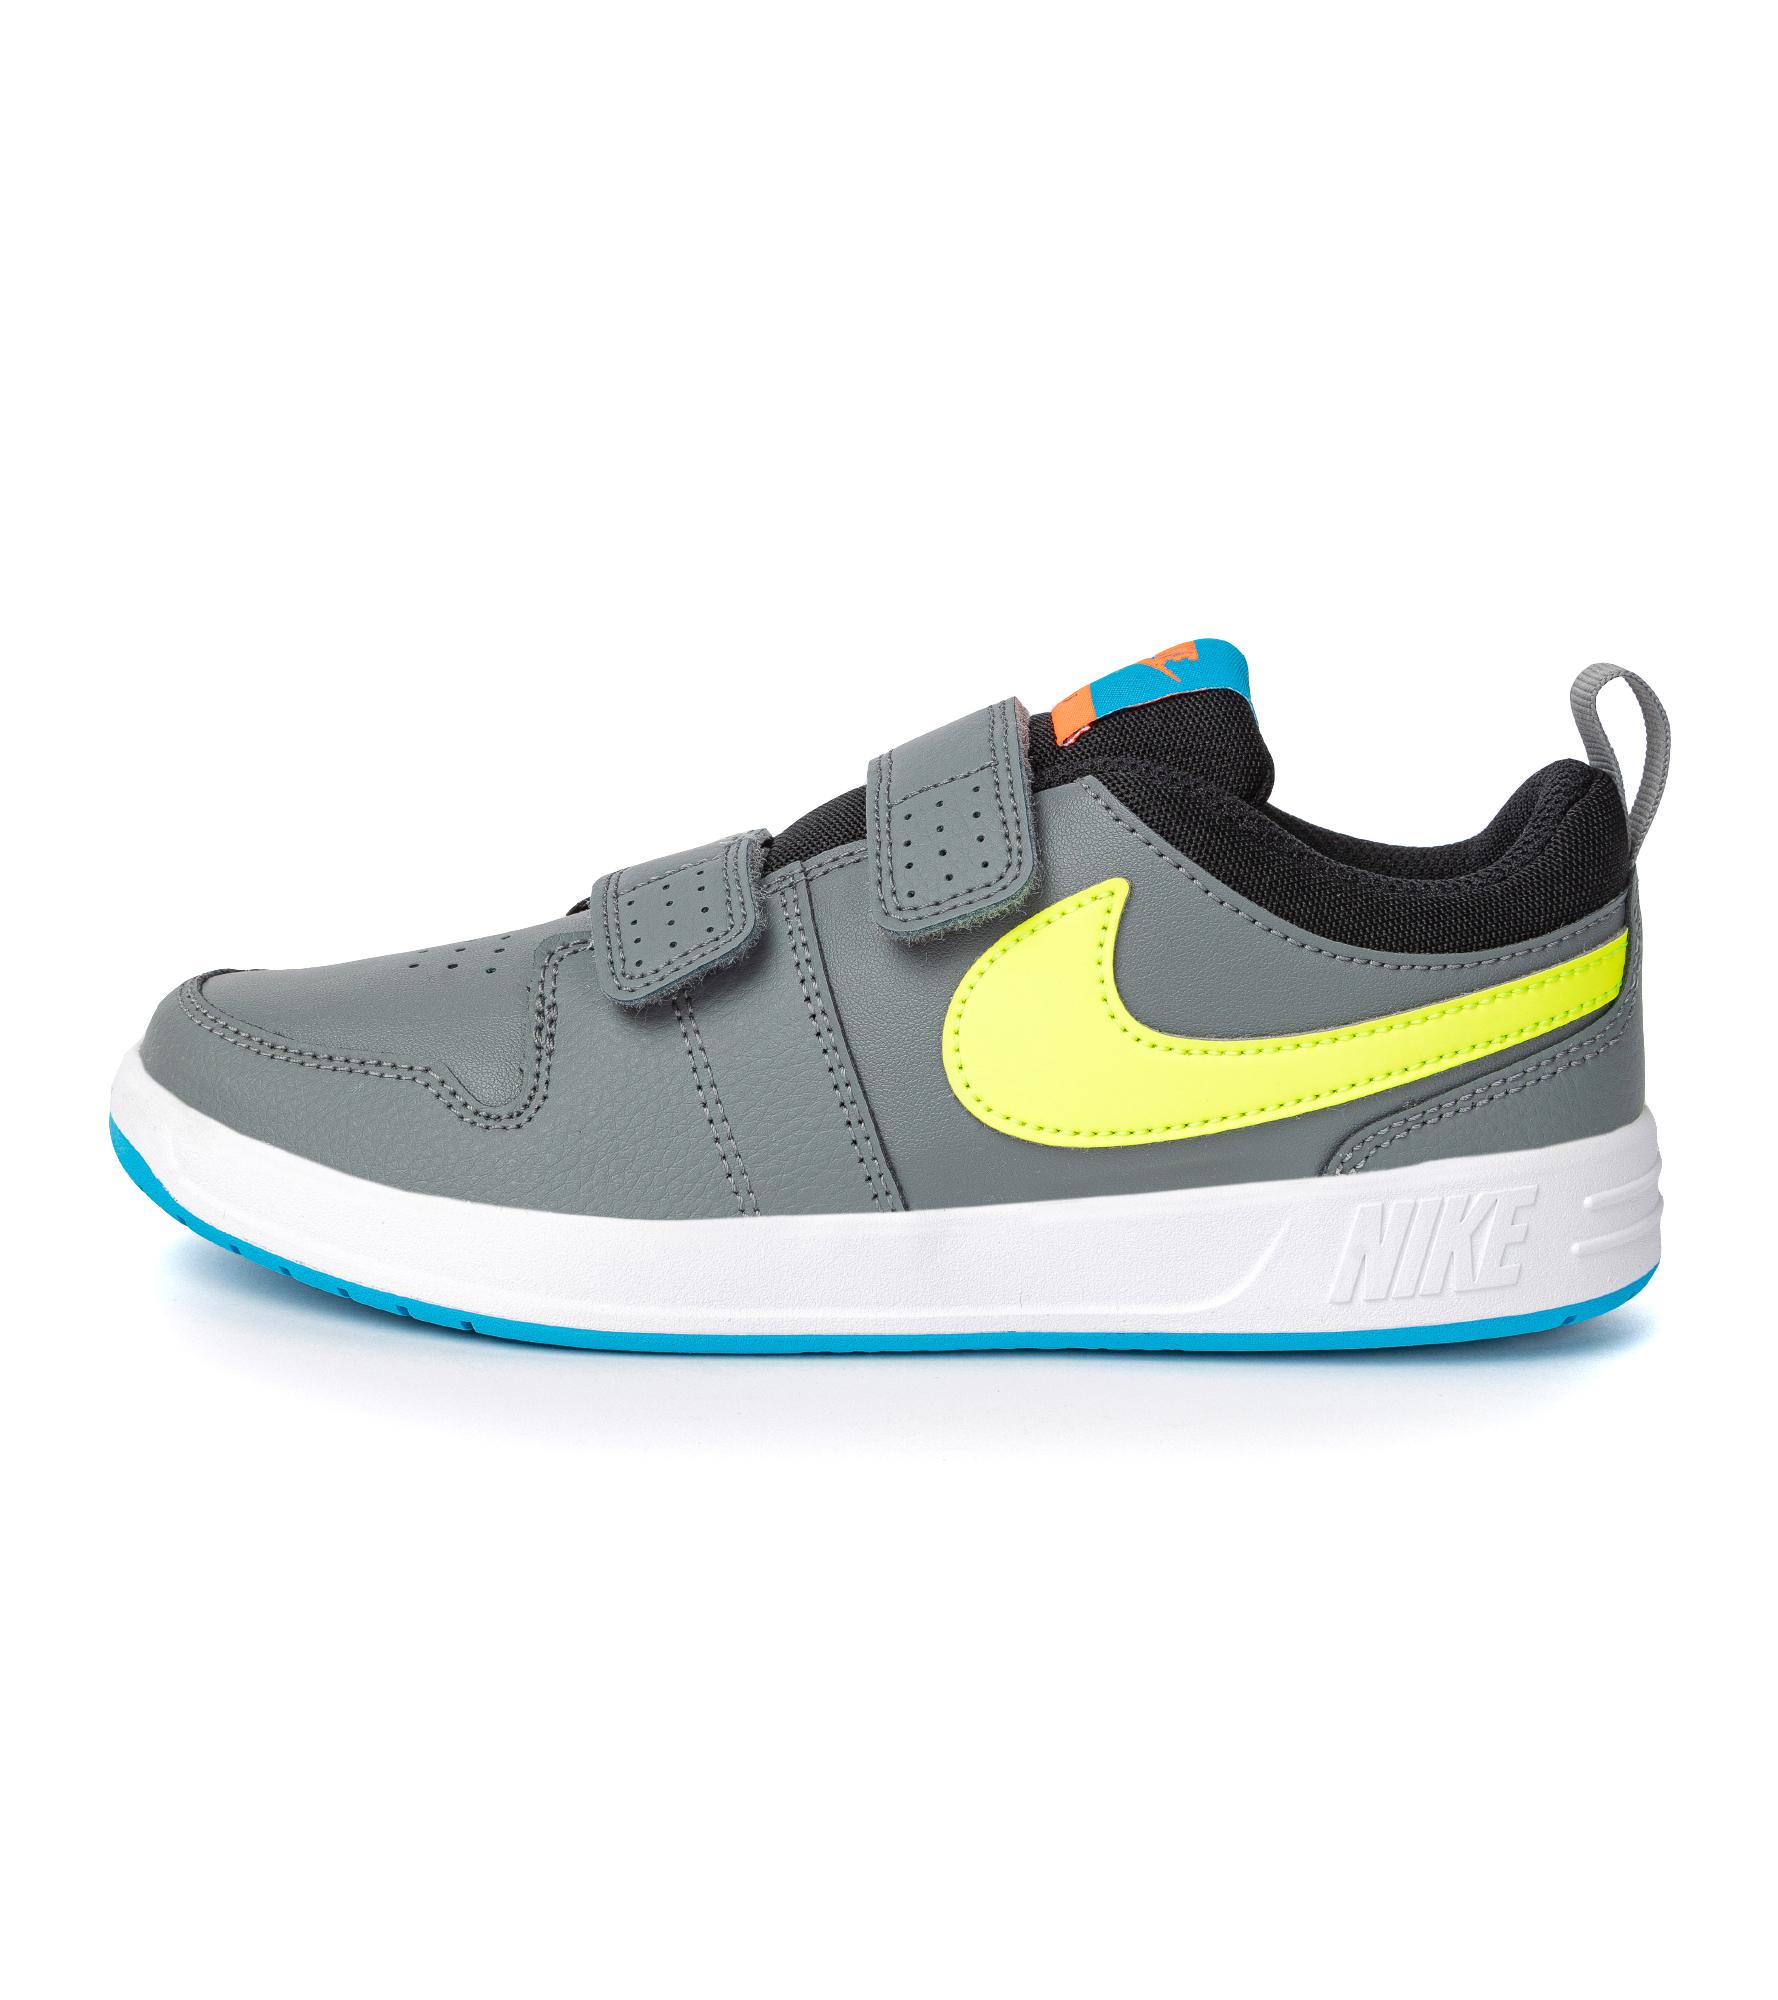 Nike Кеды для мальчиков Nike Pico 5, размер 31